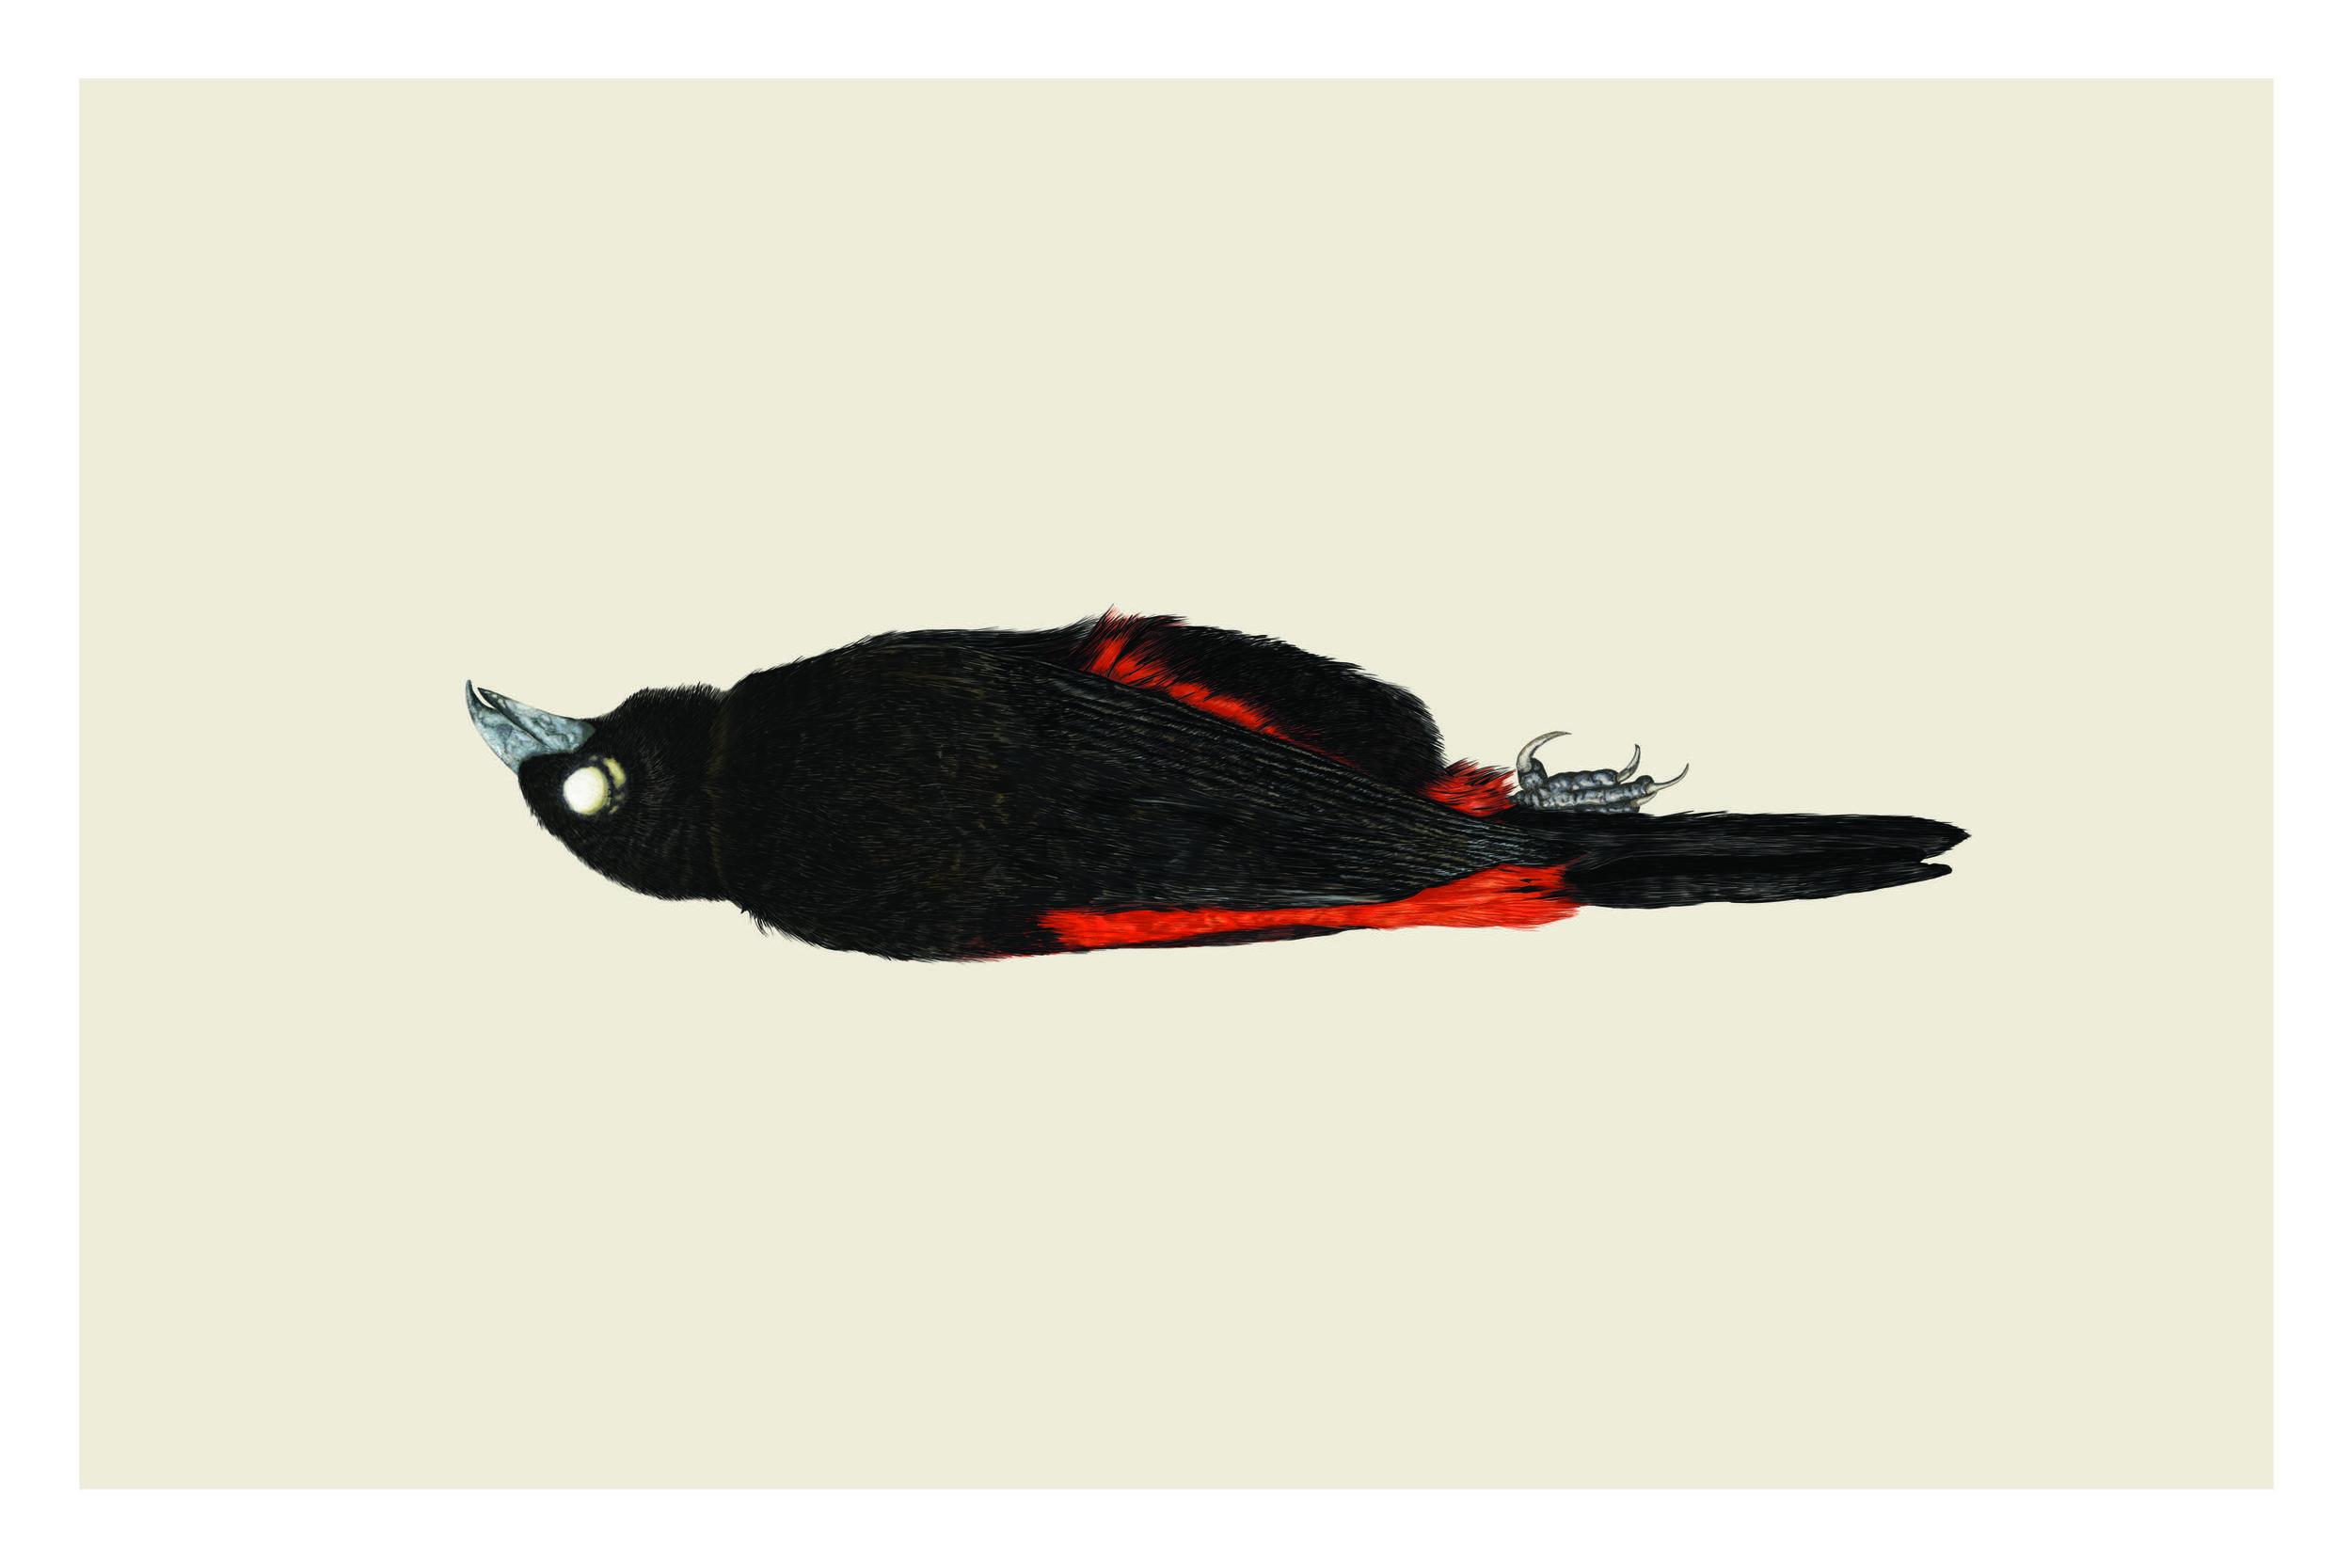 Ramphocelus flammigerus (Rojo.jpg